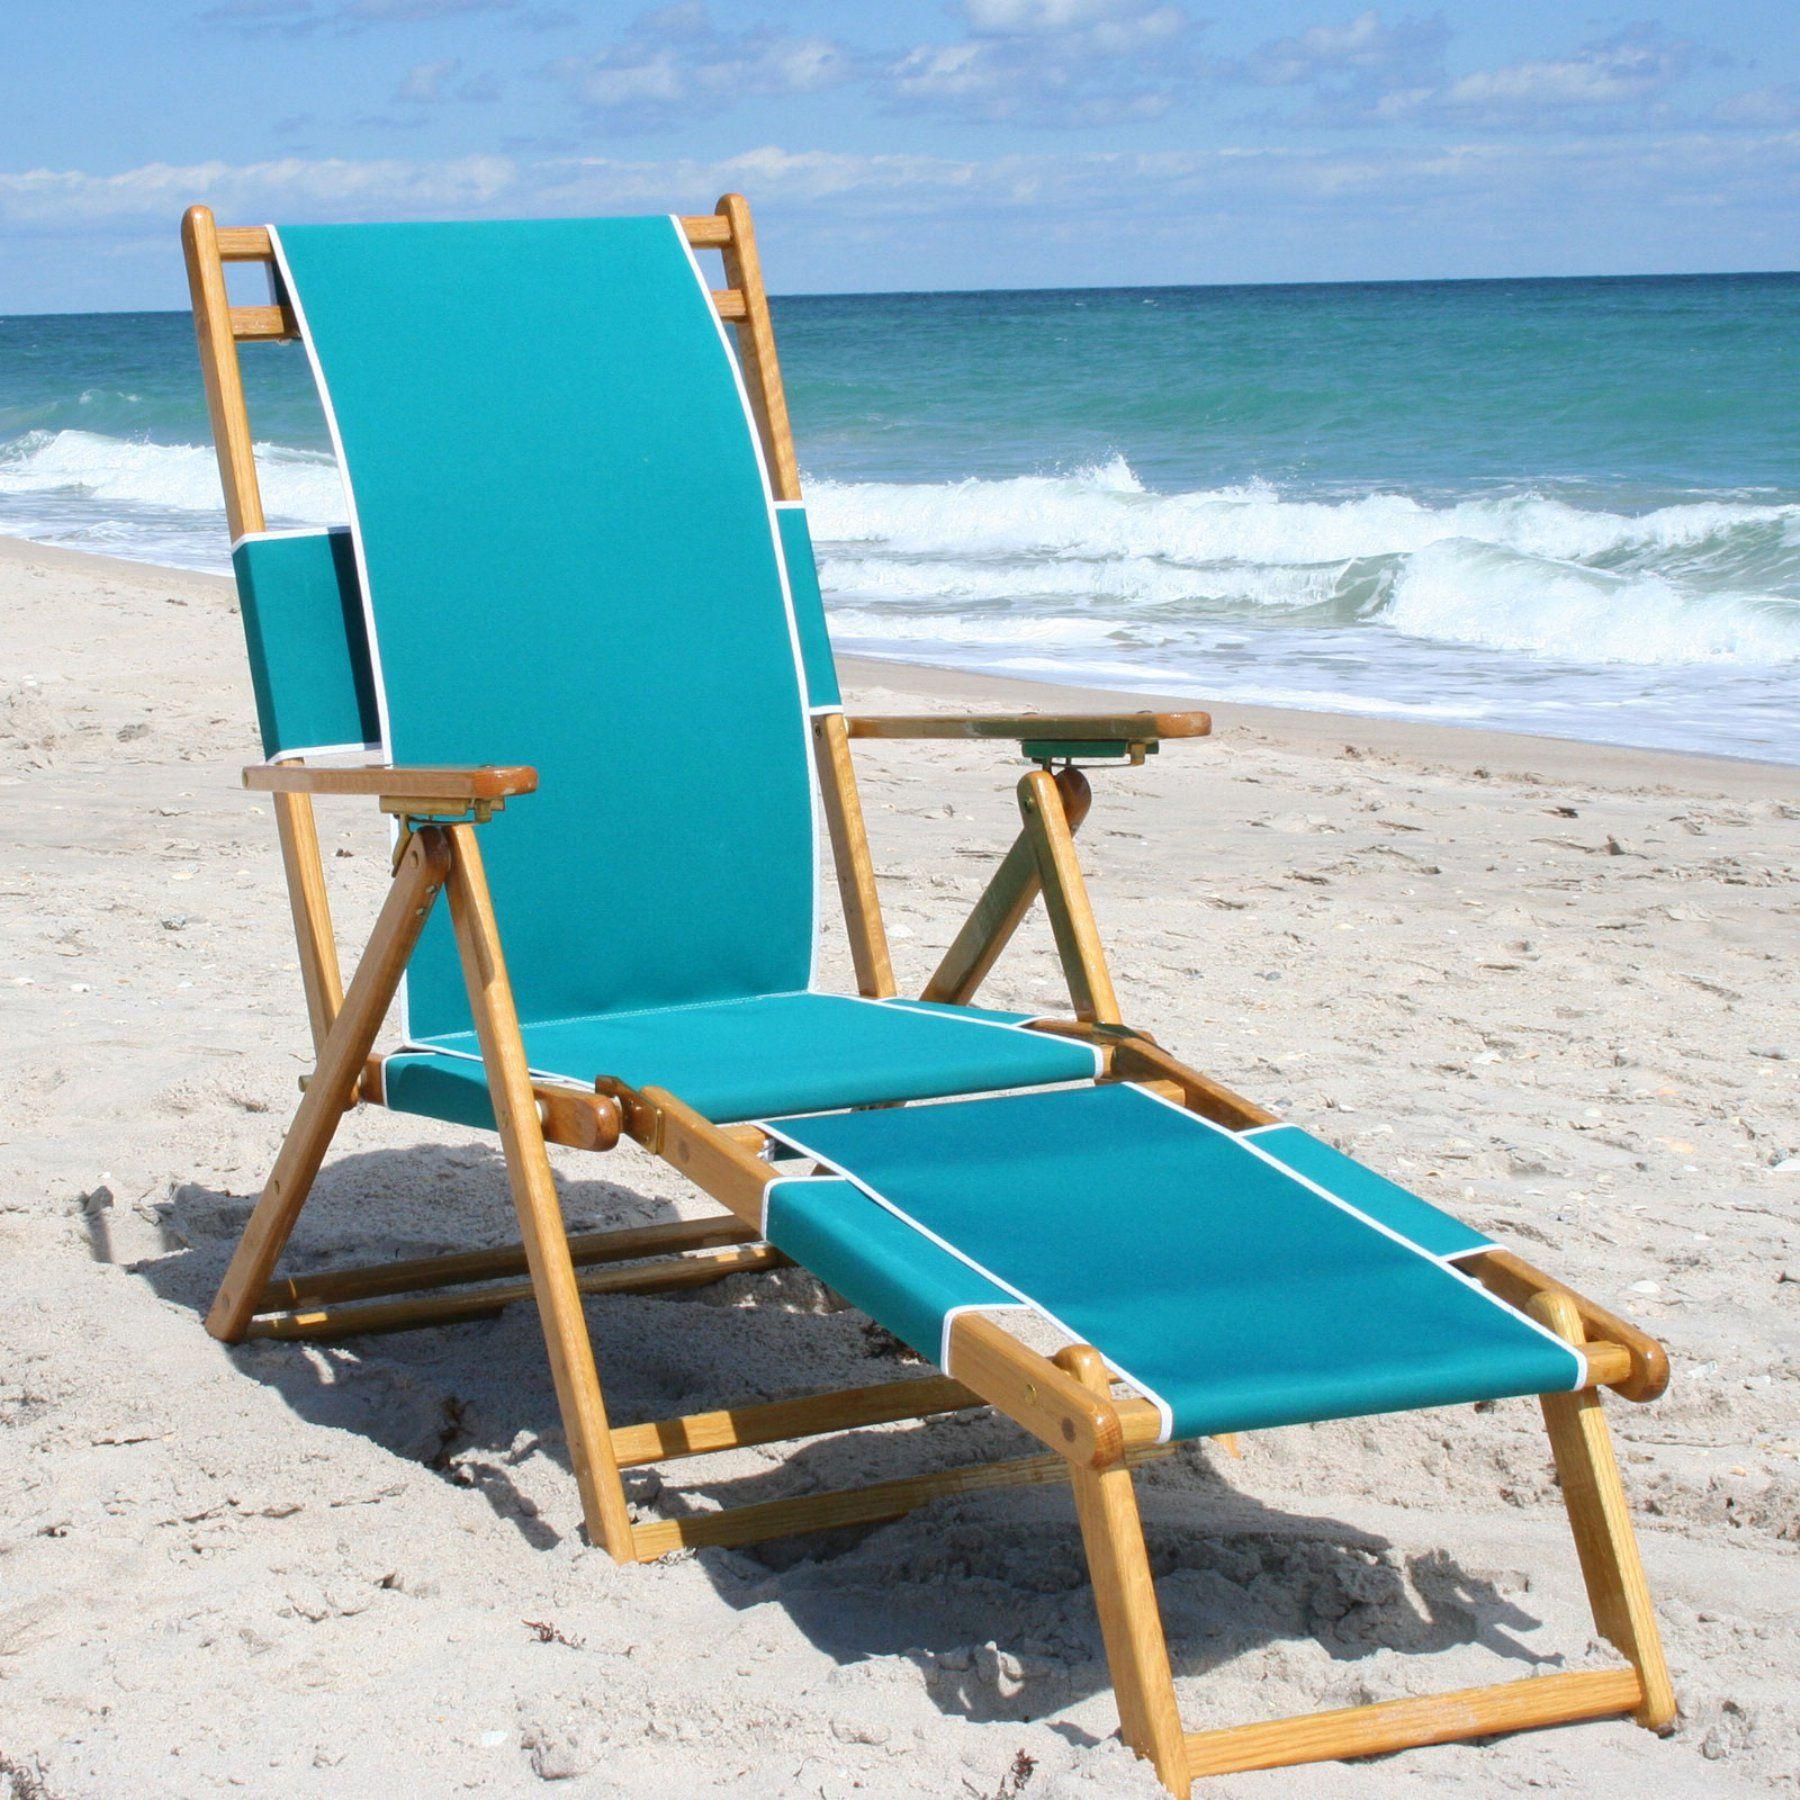 Outdoor The Original Anywhere Chair Sunbrella Lounge Chair   101/201 4601